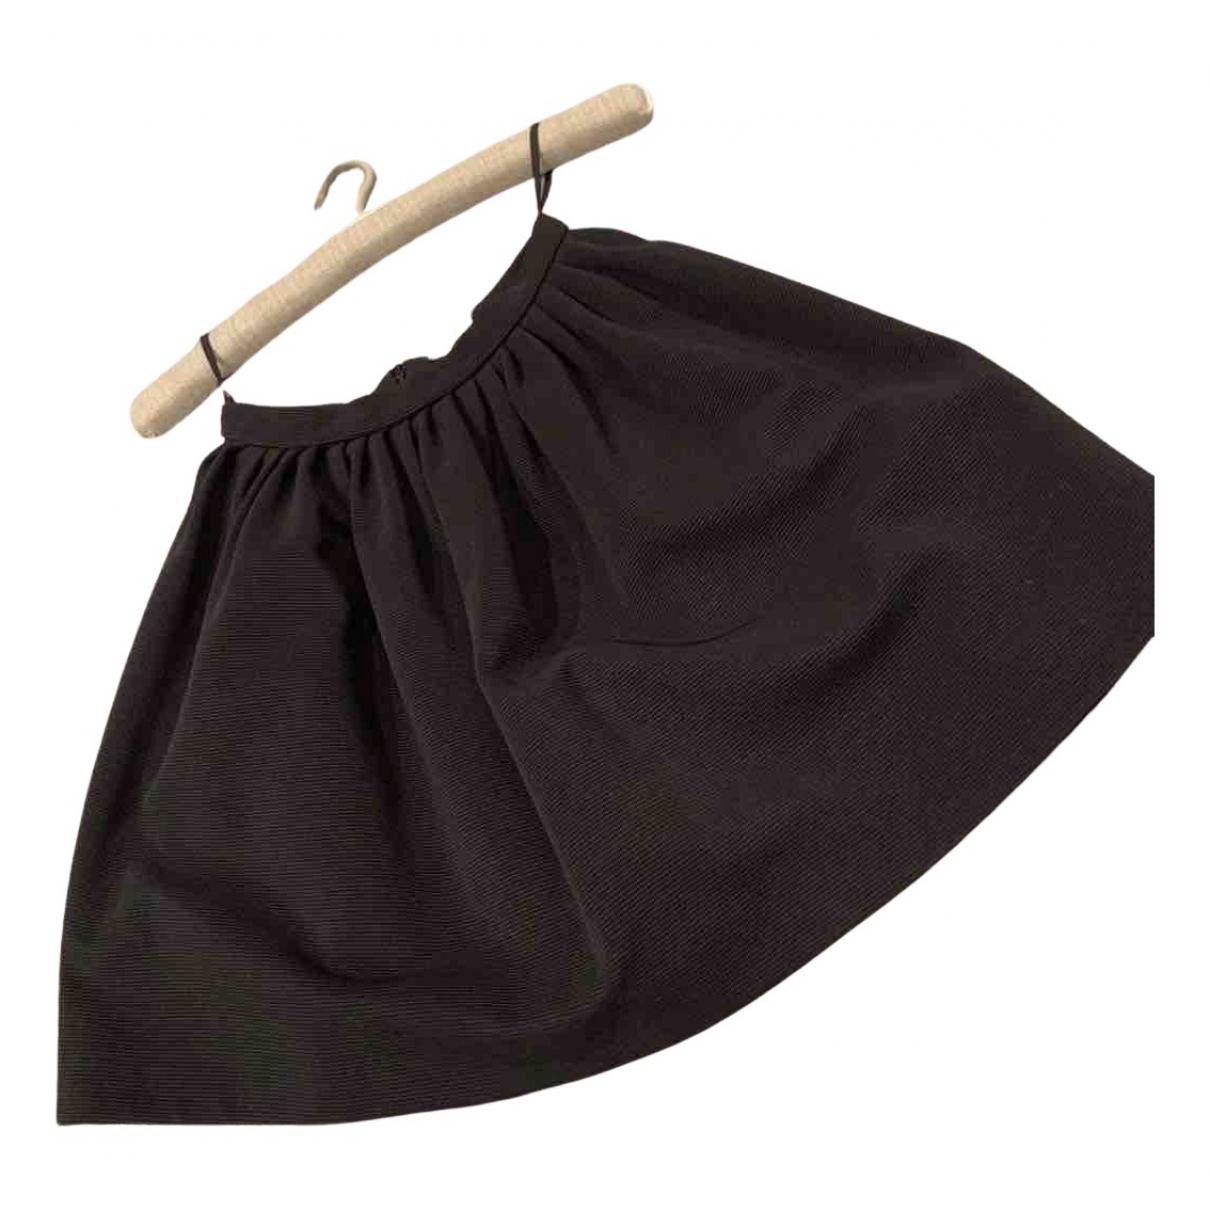 Miu Miu \N Black Cotton - elasthane skirt for Women 36 IT